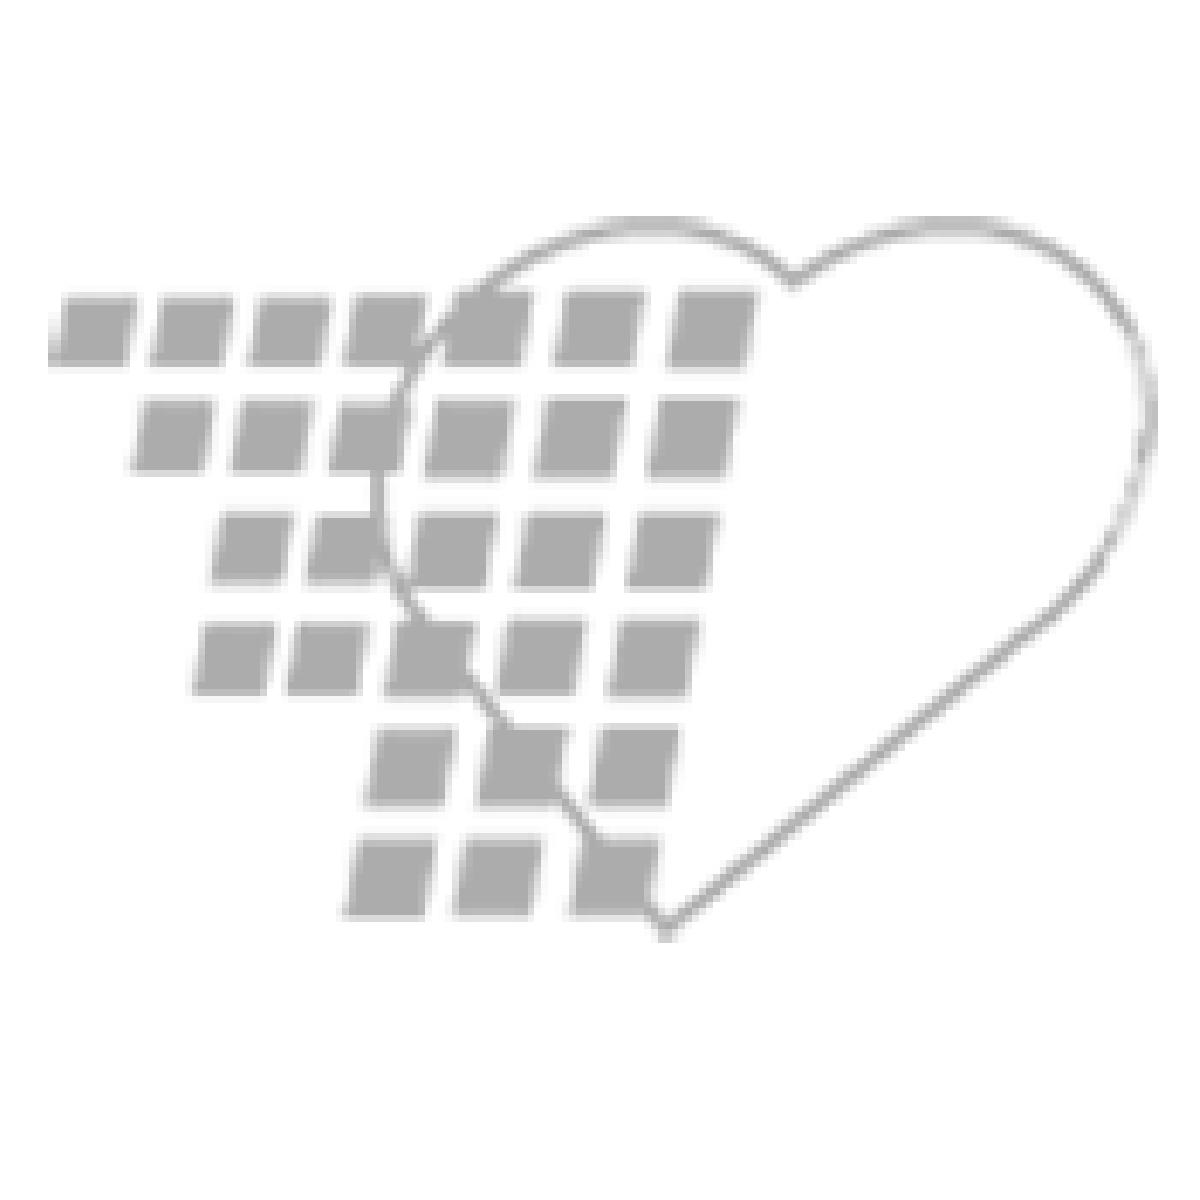 14-17-5504 Tran-4-Rea Moulage Master Kit